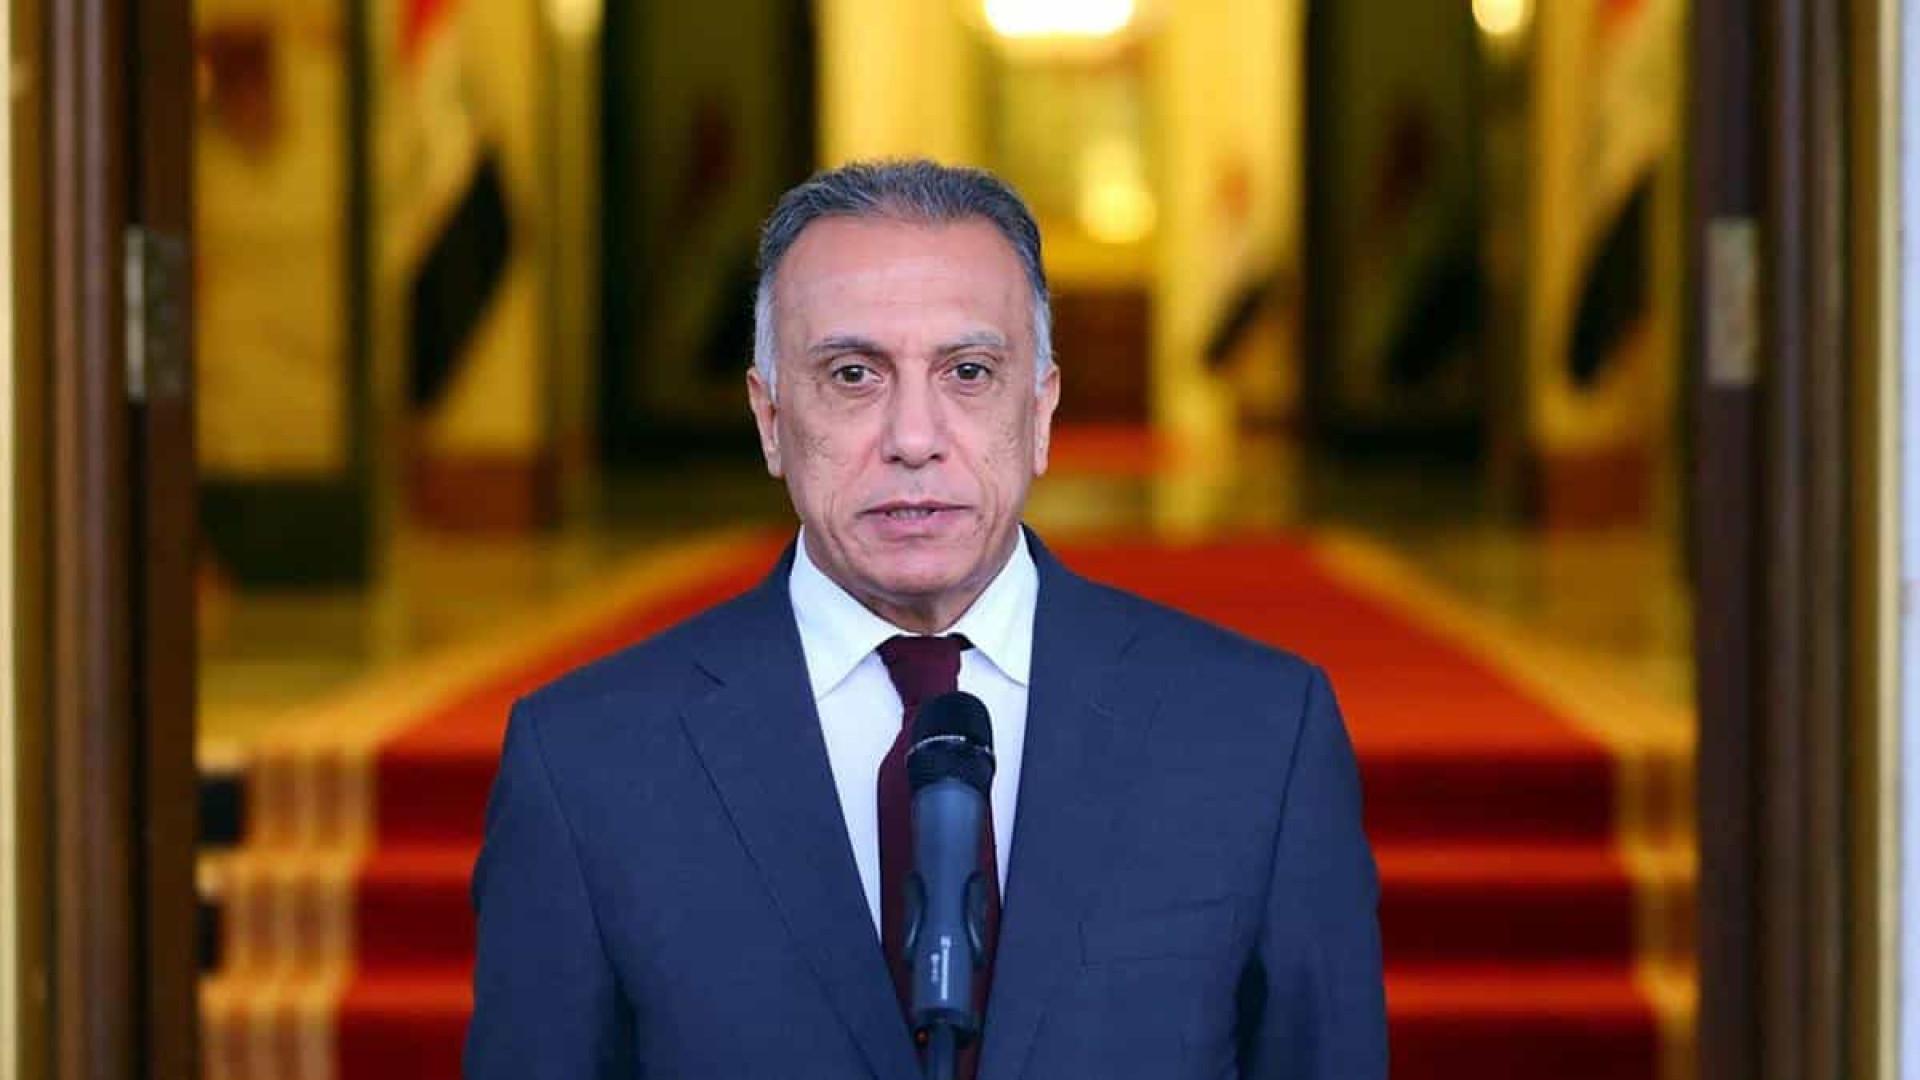 Primeiro-ministro do Iraque anuncia Dia Nacional da Tolerância